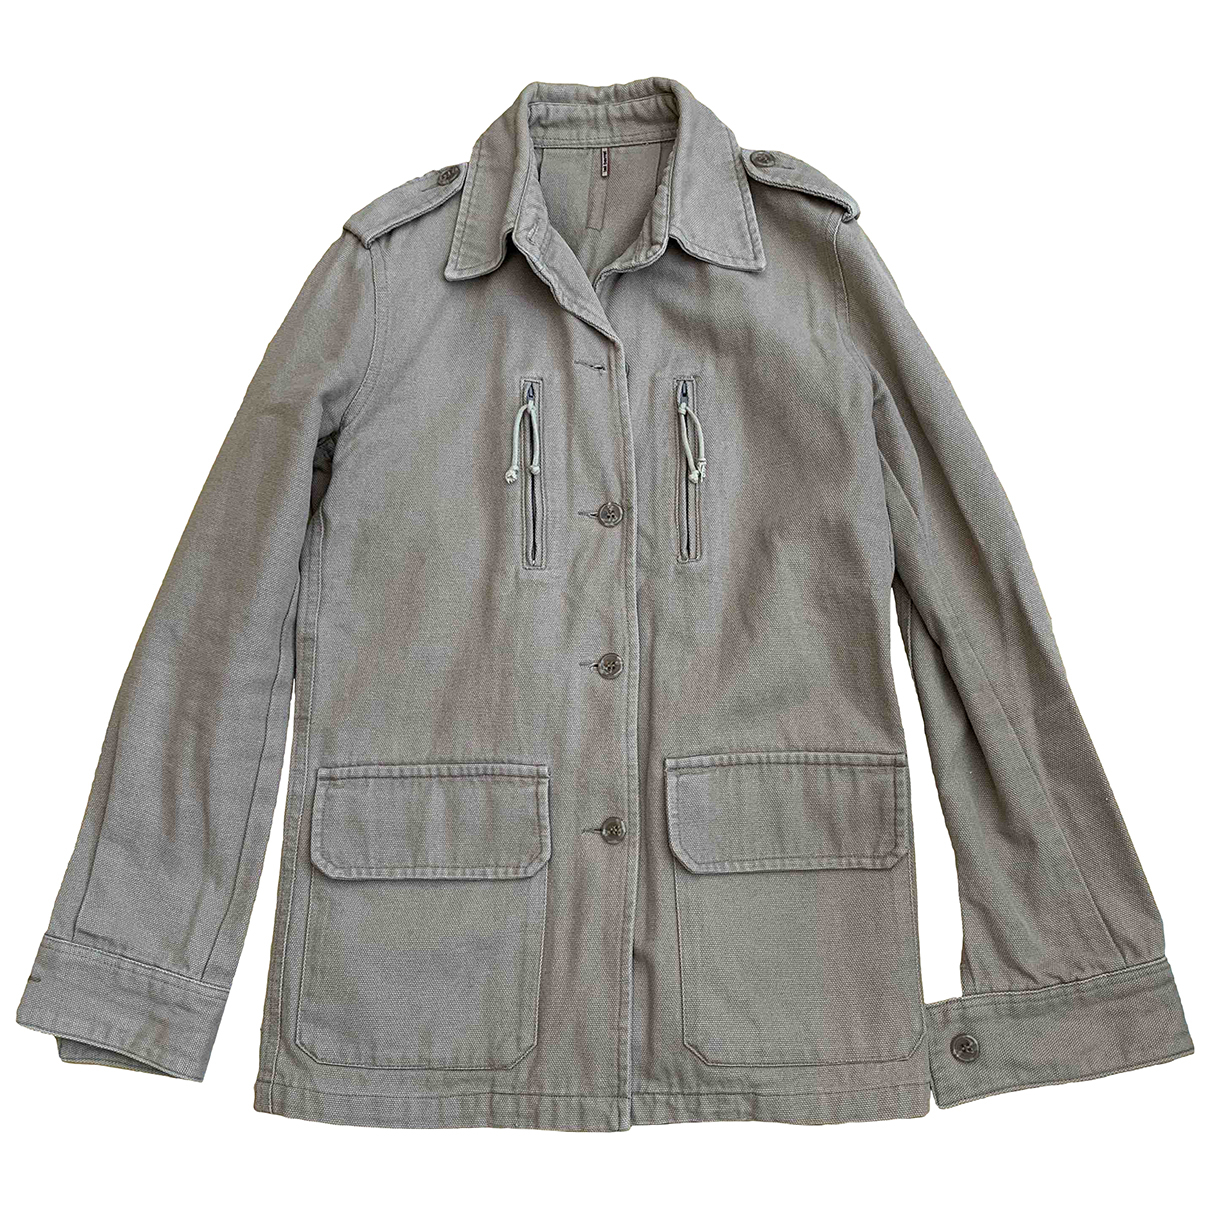 Bali Barret \N Beige Cotton jacket for Women 38 FR